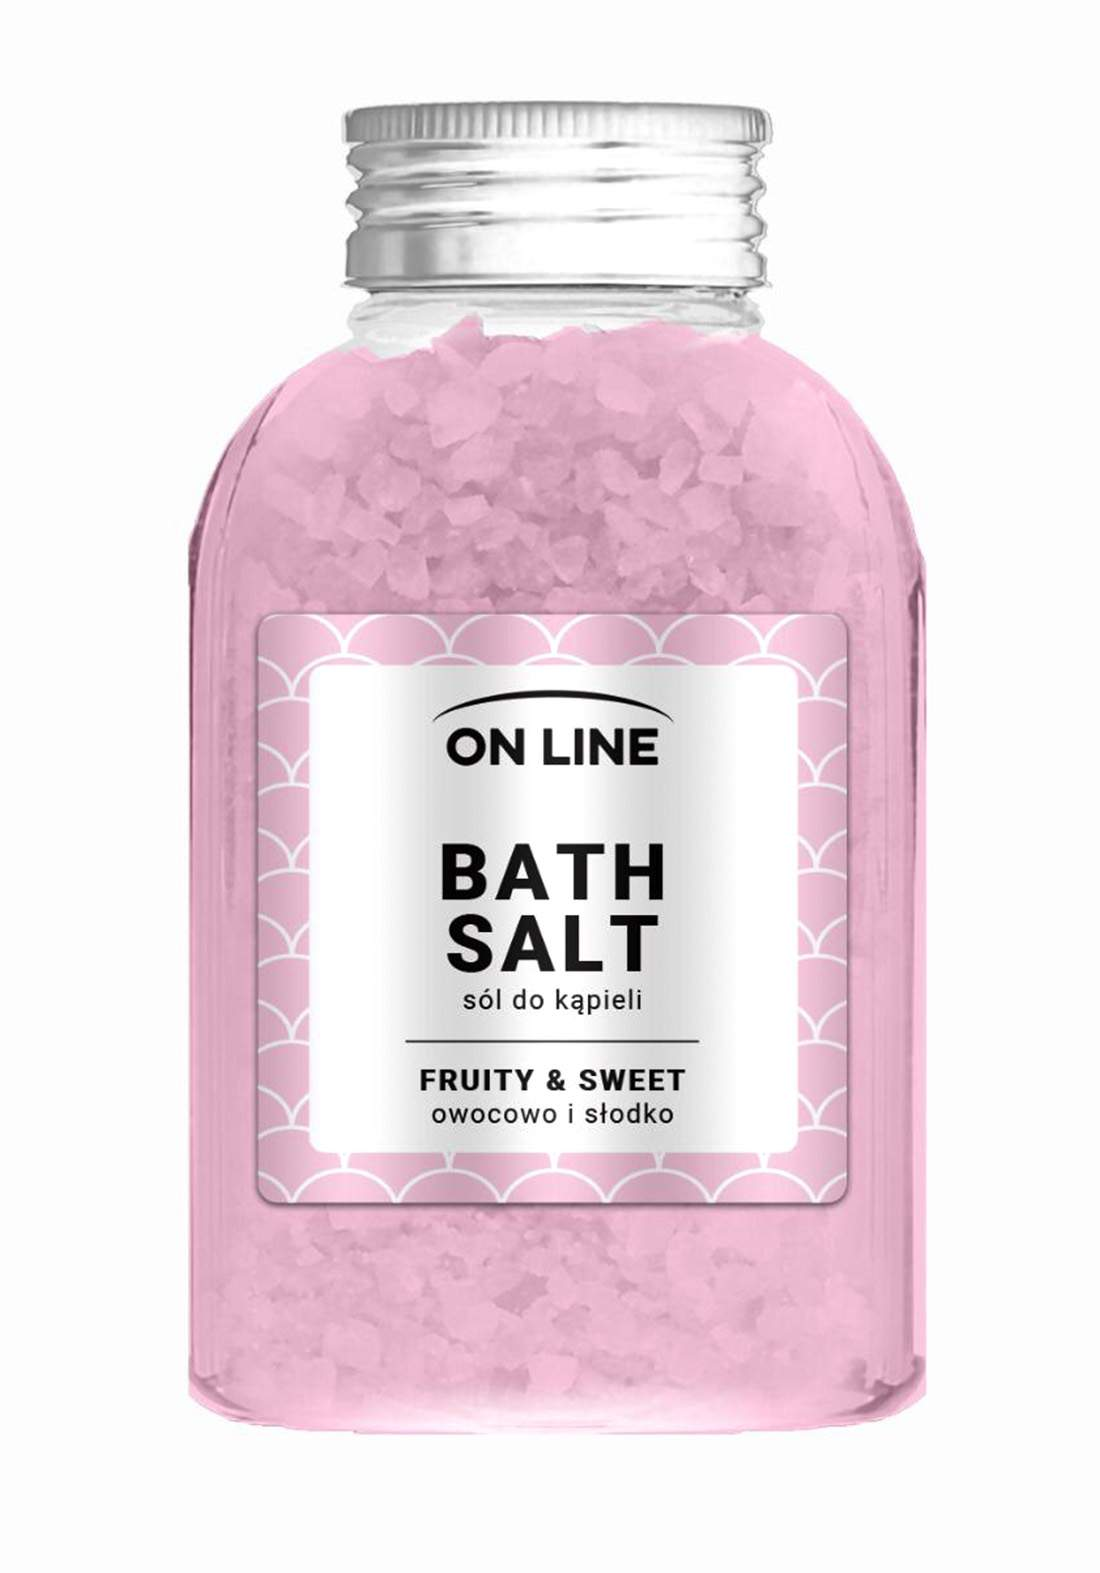 Online Fruity&sweet bath salts 600g املاح العناية بالجسم